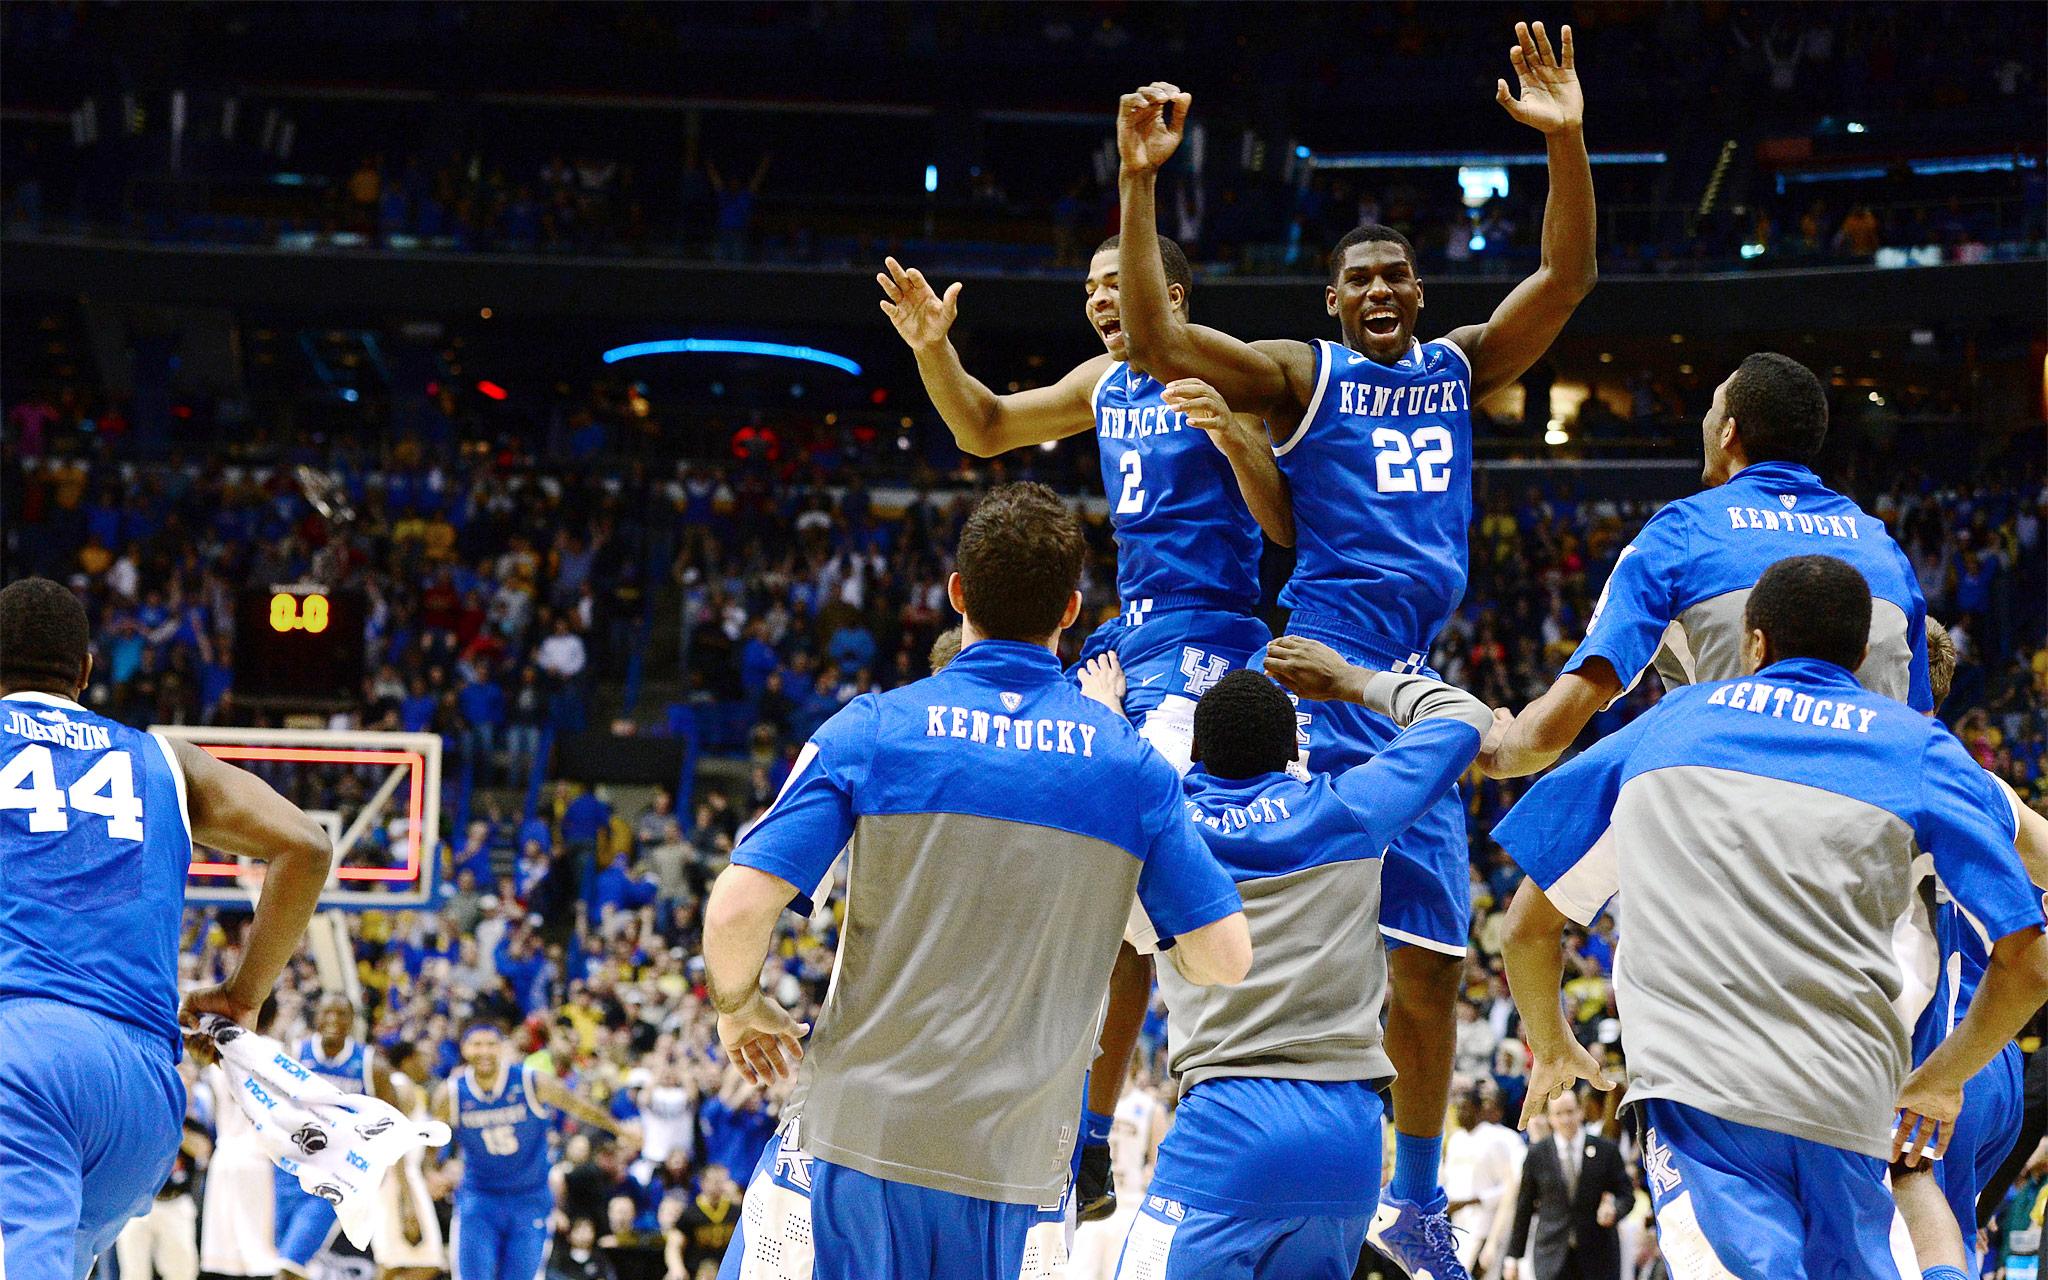 Kentucky celebration